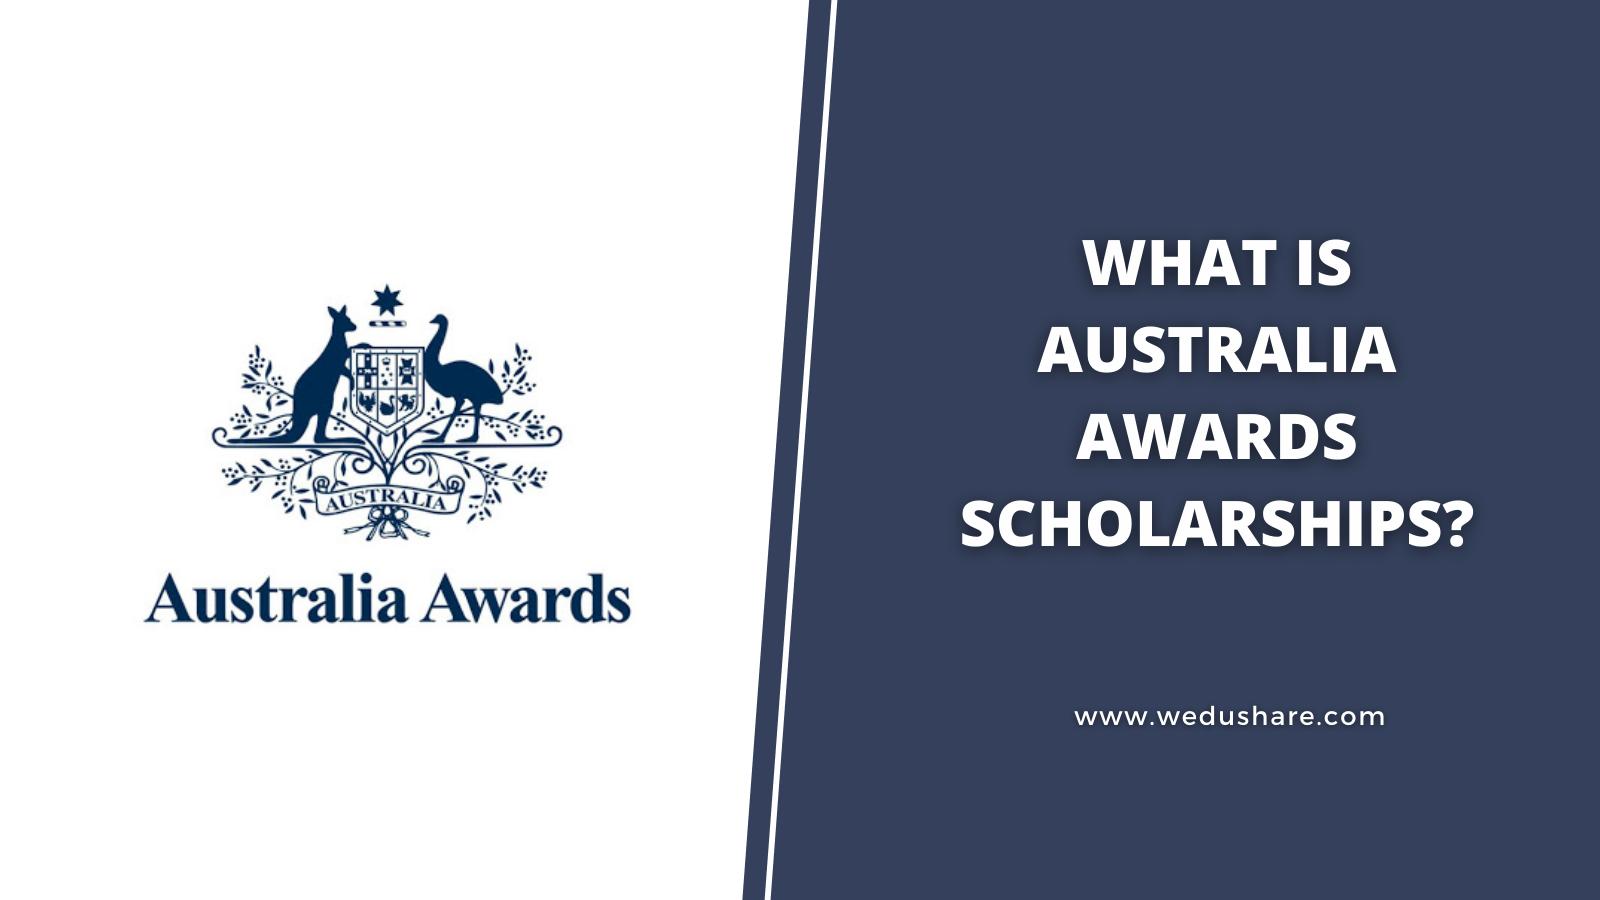 What is Australia Awards Scholarships?